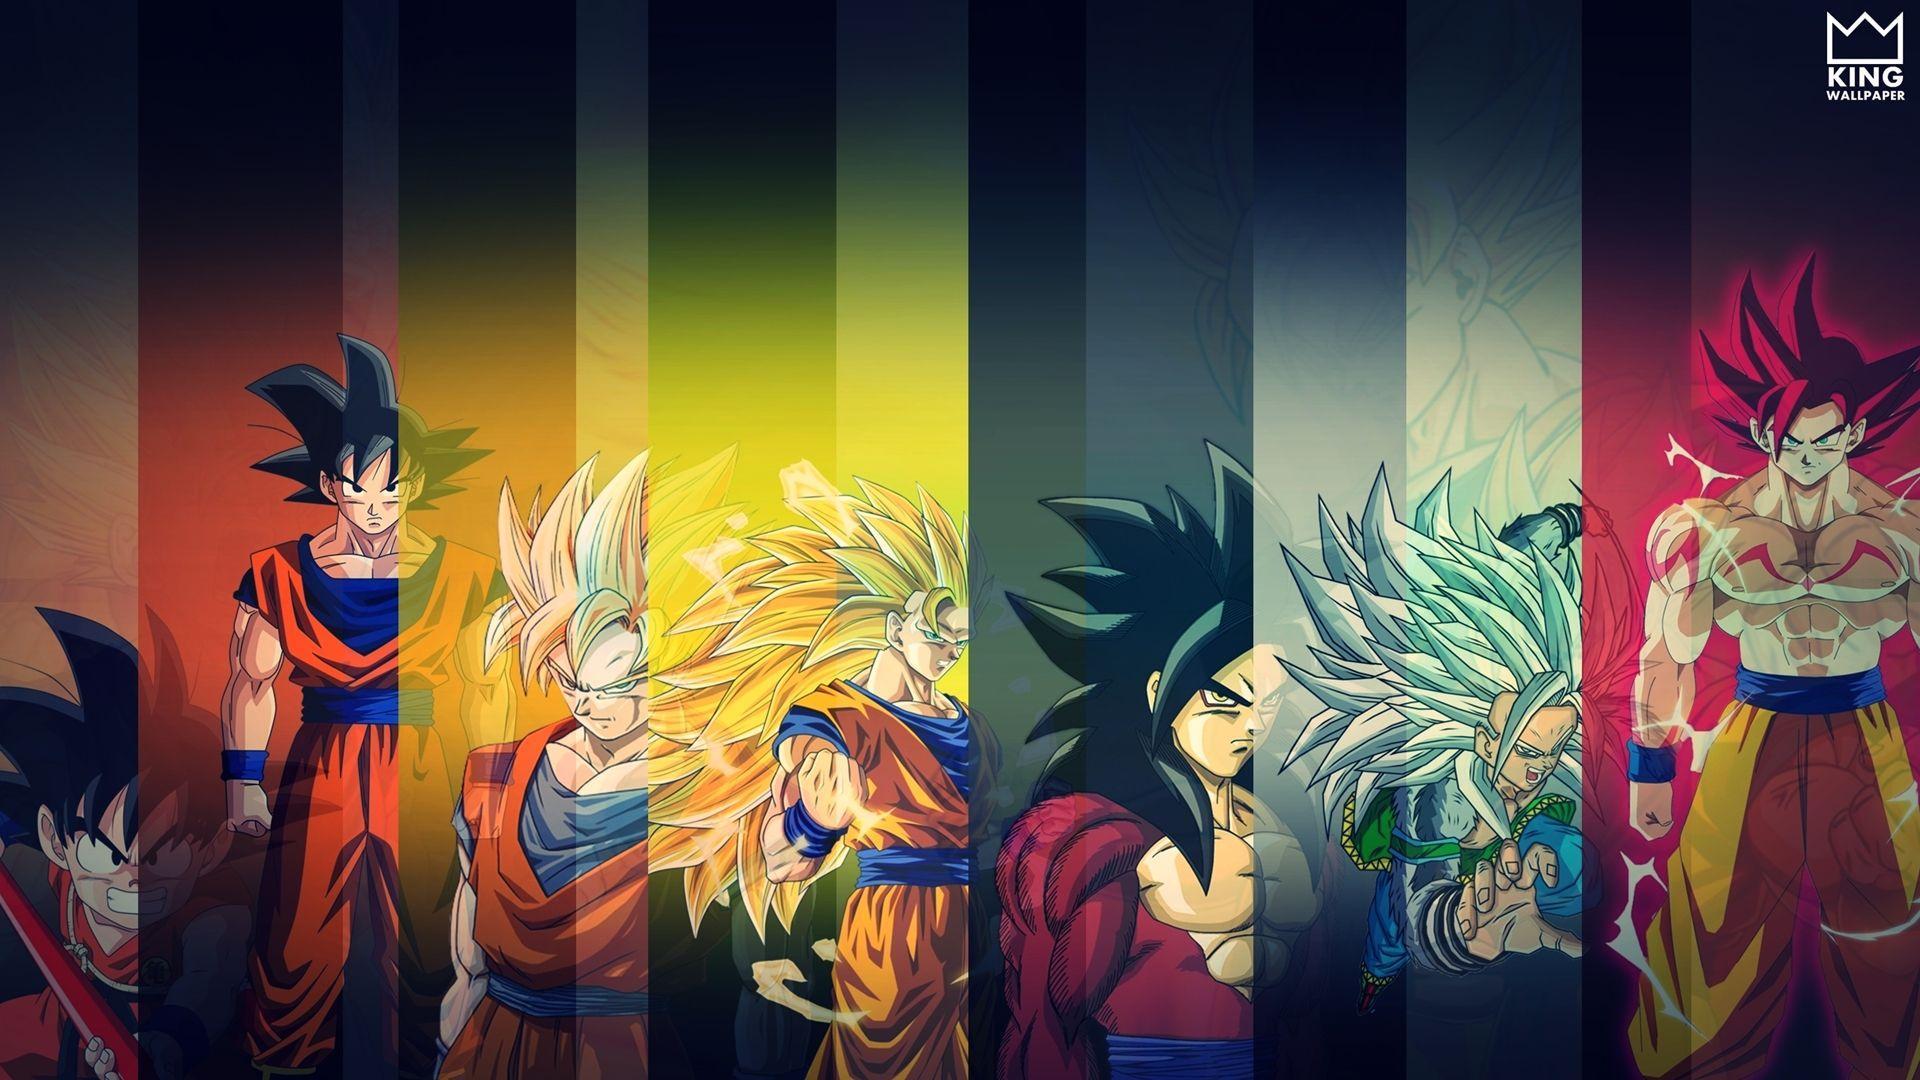 Dragon Ball Z Wallpapers Hd Wallpaper Cave